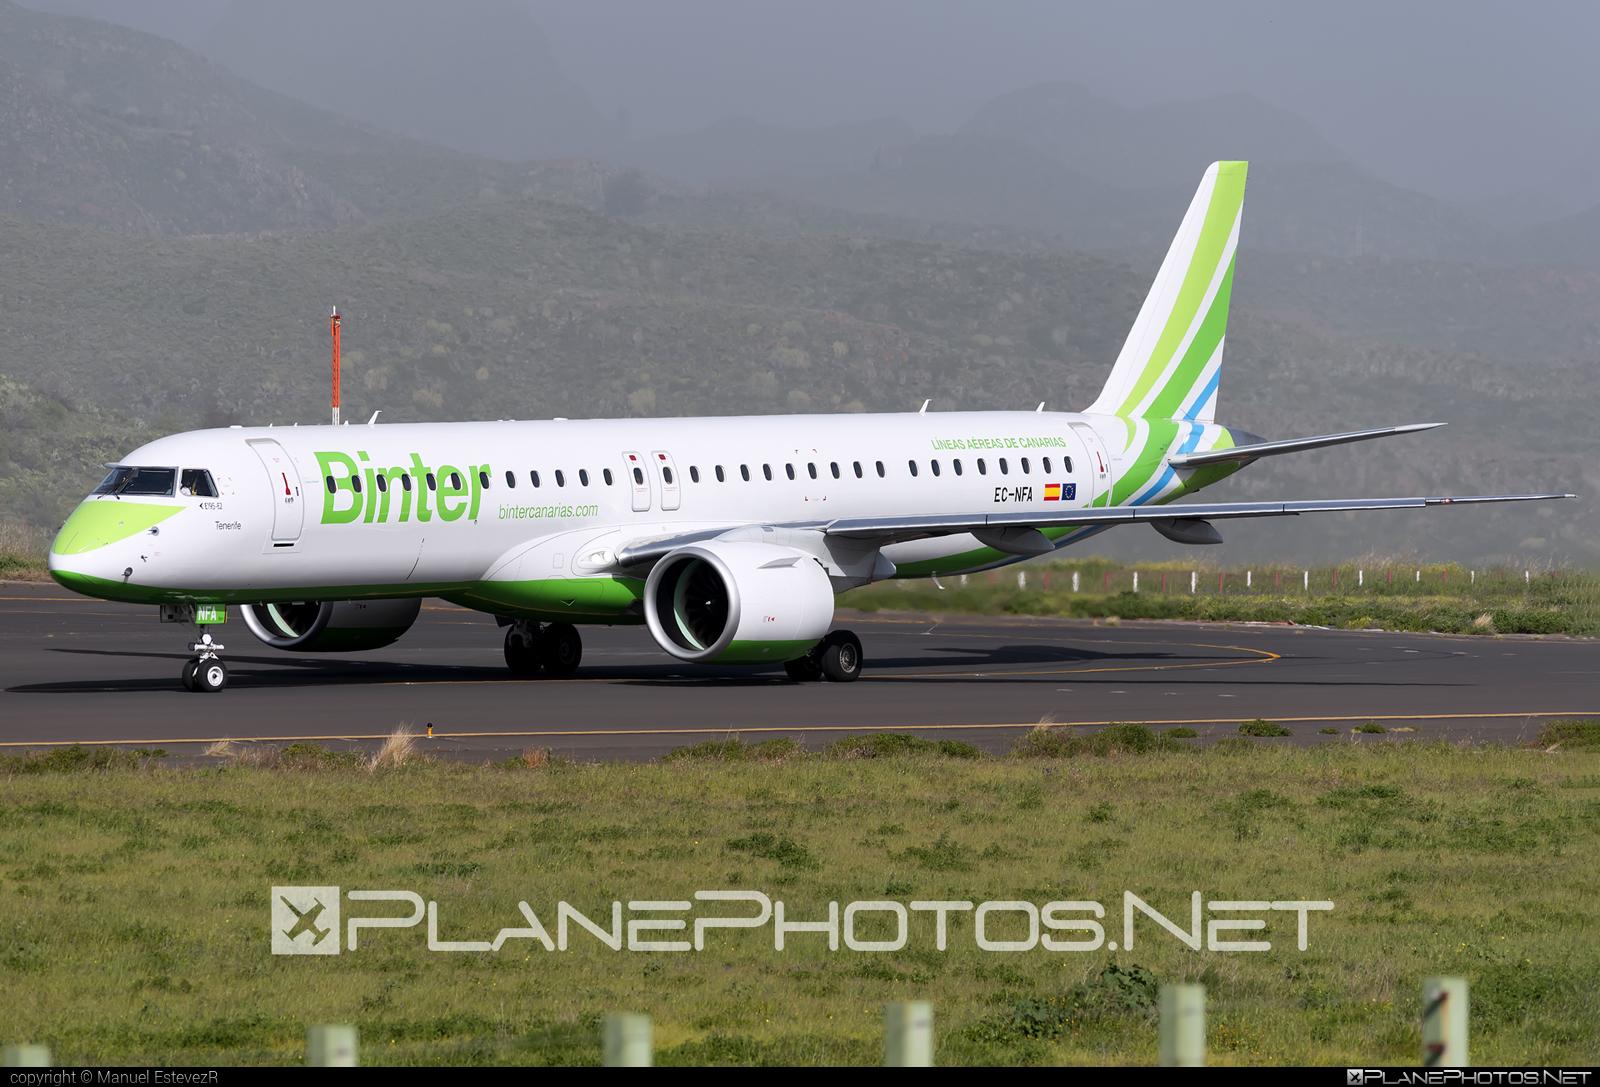 Embraer E195-E2 (ERJ-190-400STD) - EC-NFA operated by Binter Canarias #e195 #e195e2 #embraer #embraer190400 #embraer190400std #embraer195 #embraer195e2 #erj190400 #erj190400std